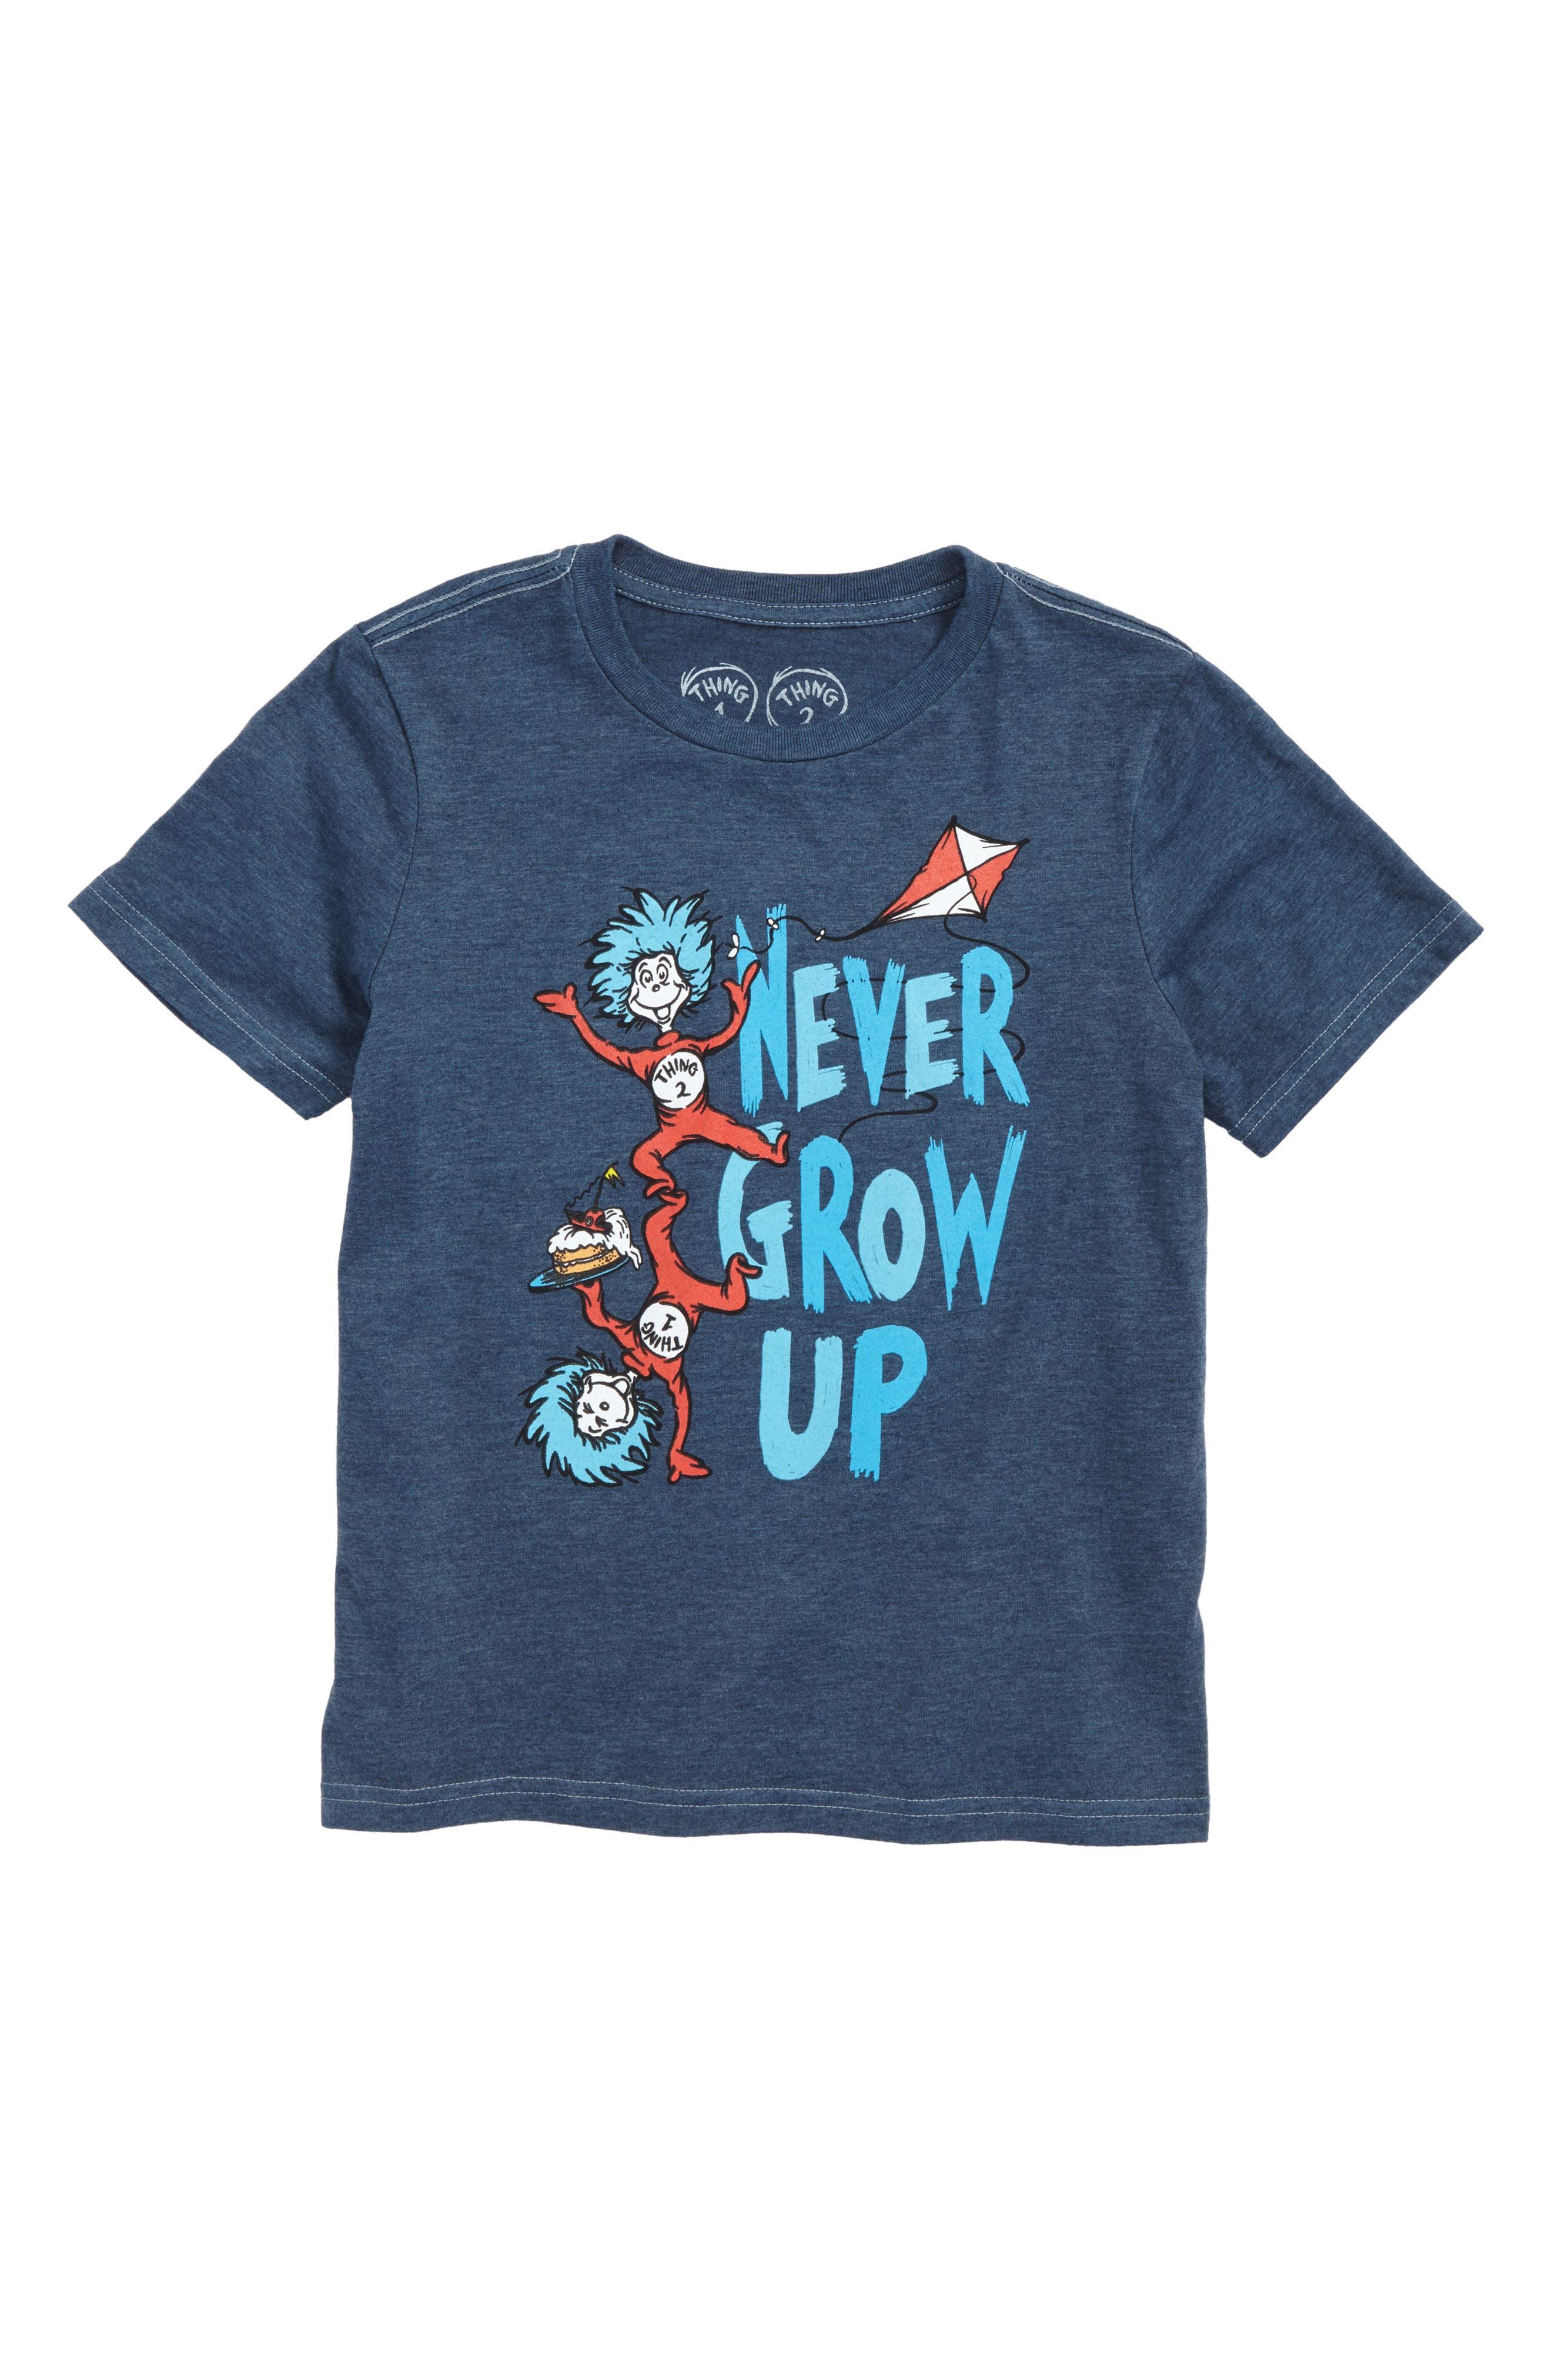 x Dr. Seuss Never Grow Up Graphic T-Shirt,                         Main,                         color, 400